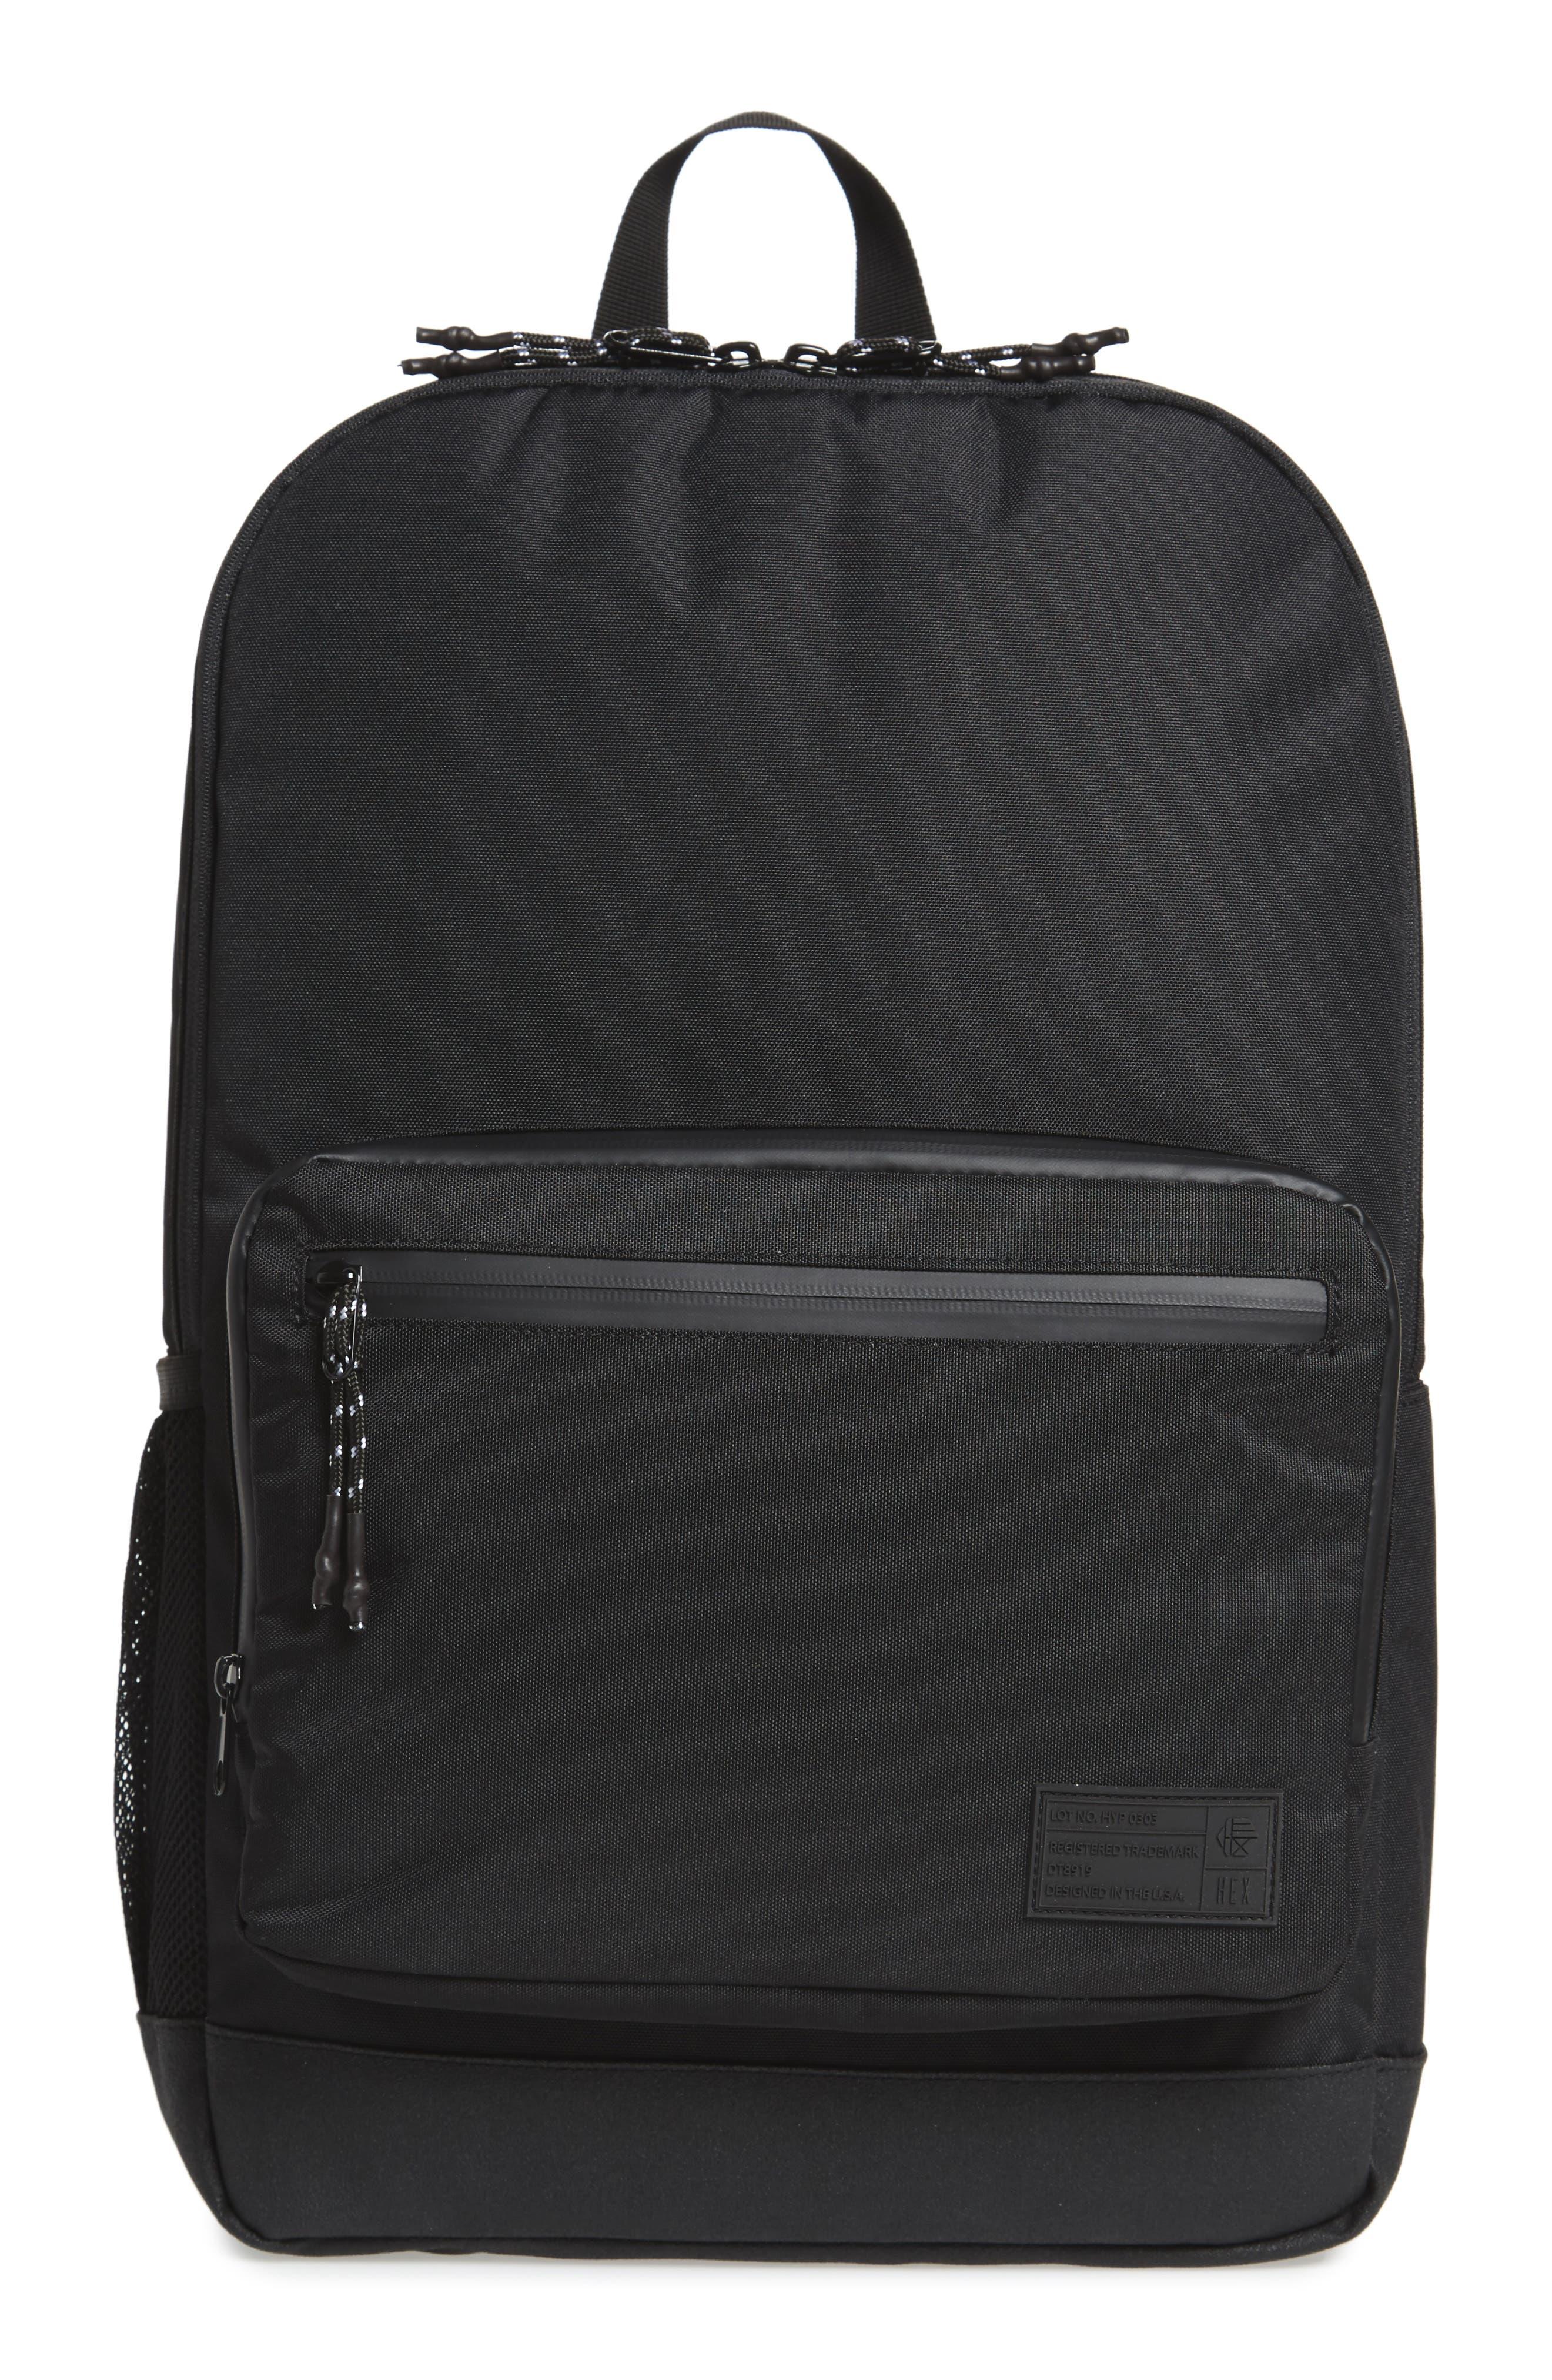 Surf Backpack,                         Main,                         color, 001